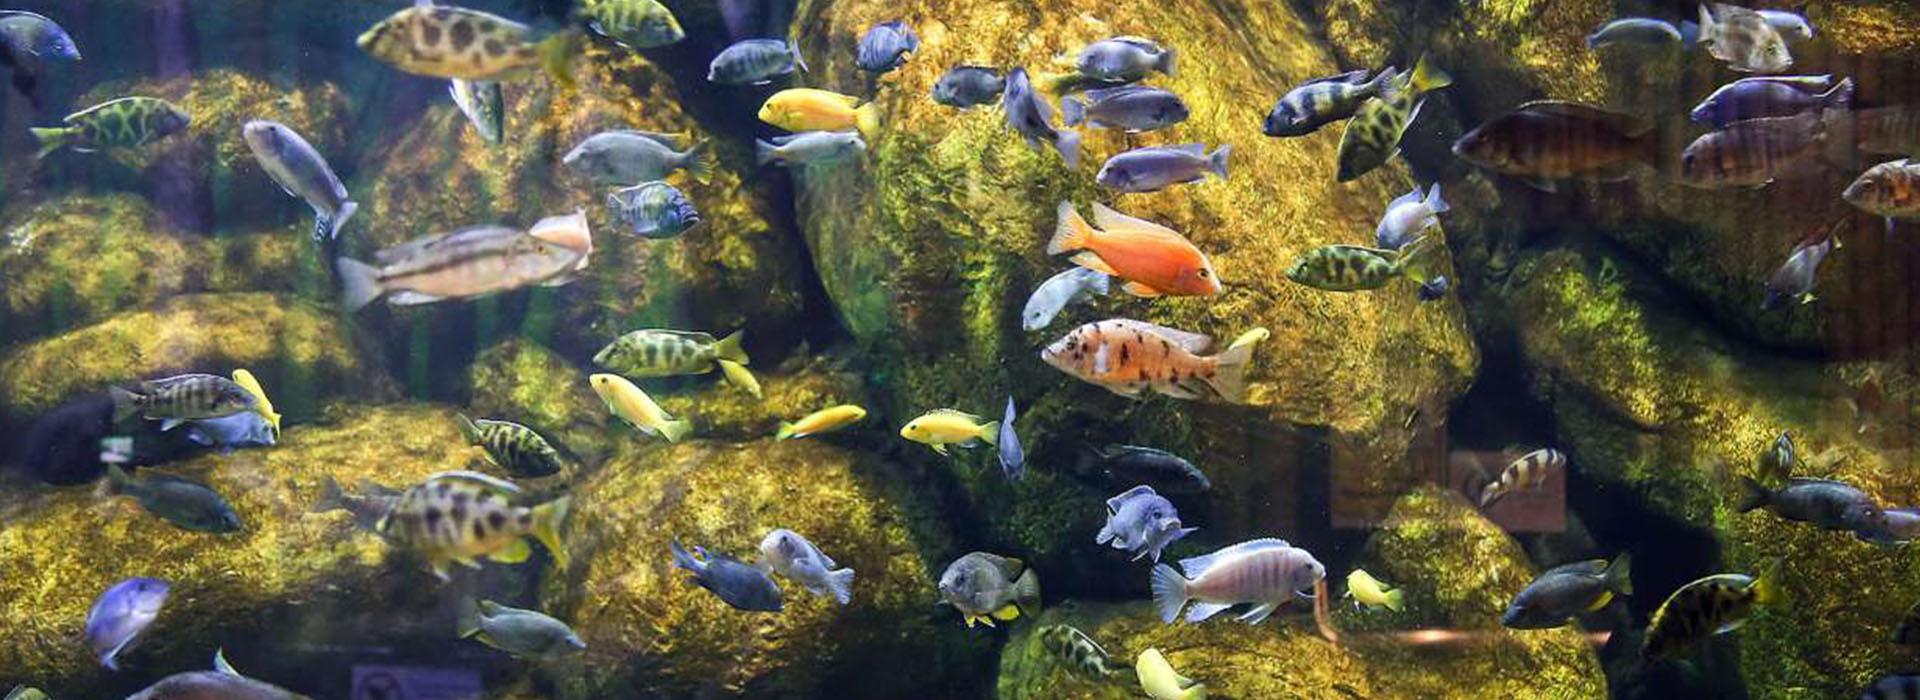 The Largest Aquarium Tunnel in Iran Opens in Bandar-e Anzali